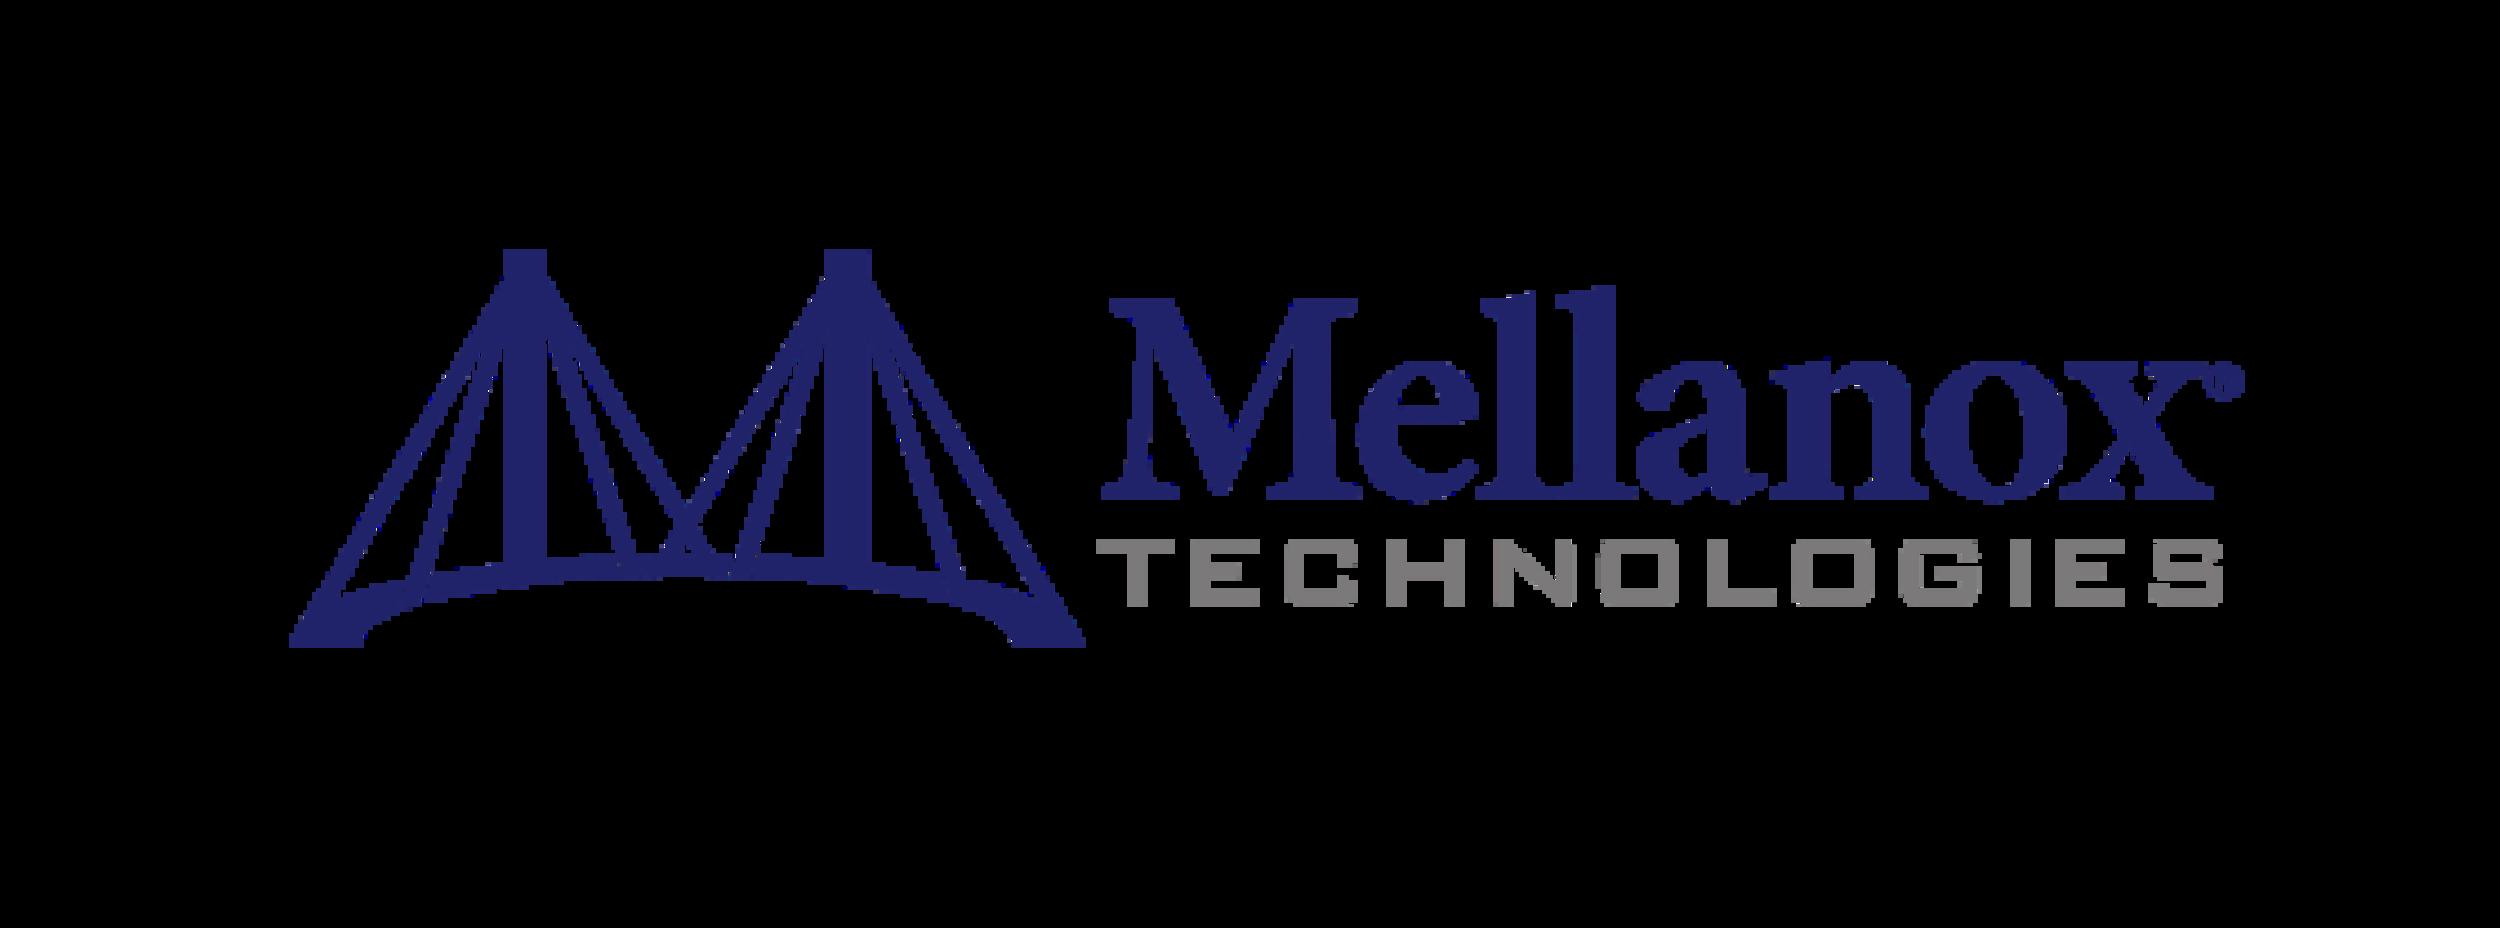 Partner_Logo_Mellanox-01.png